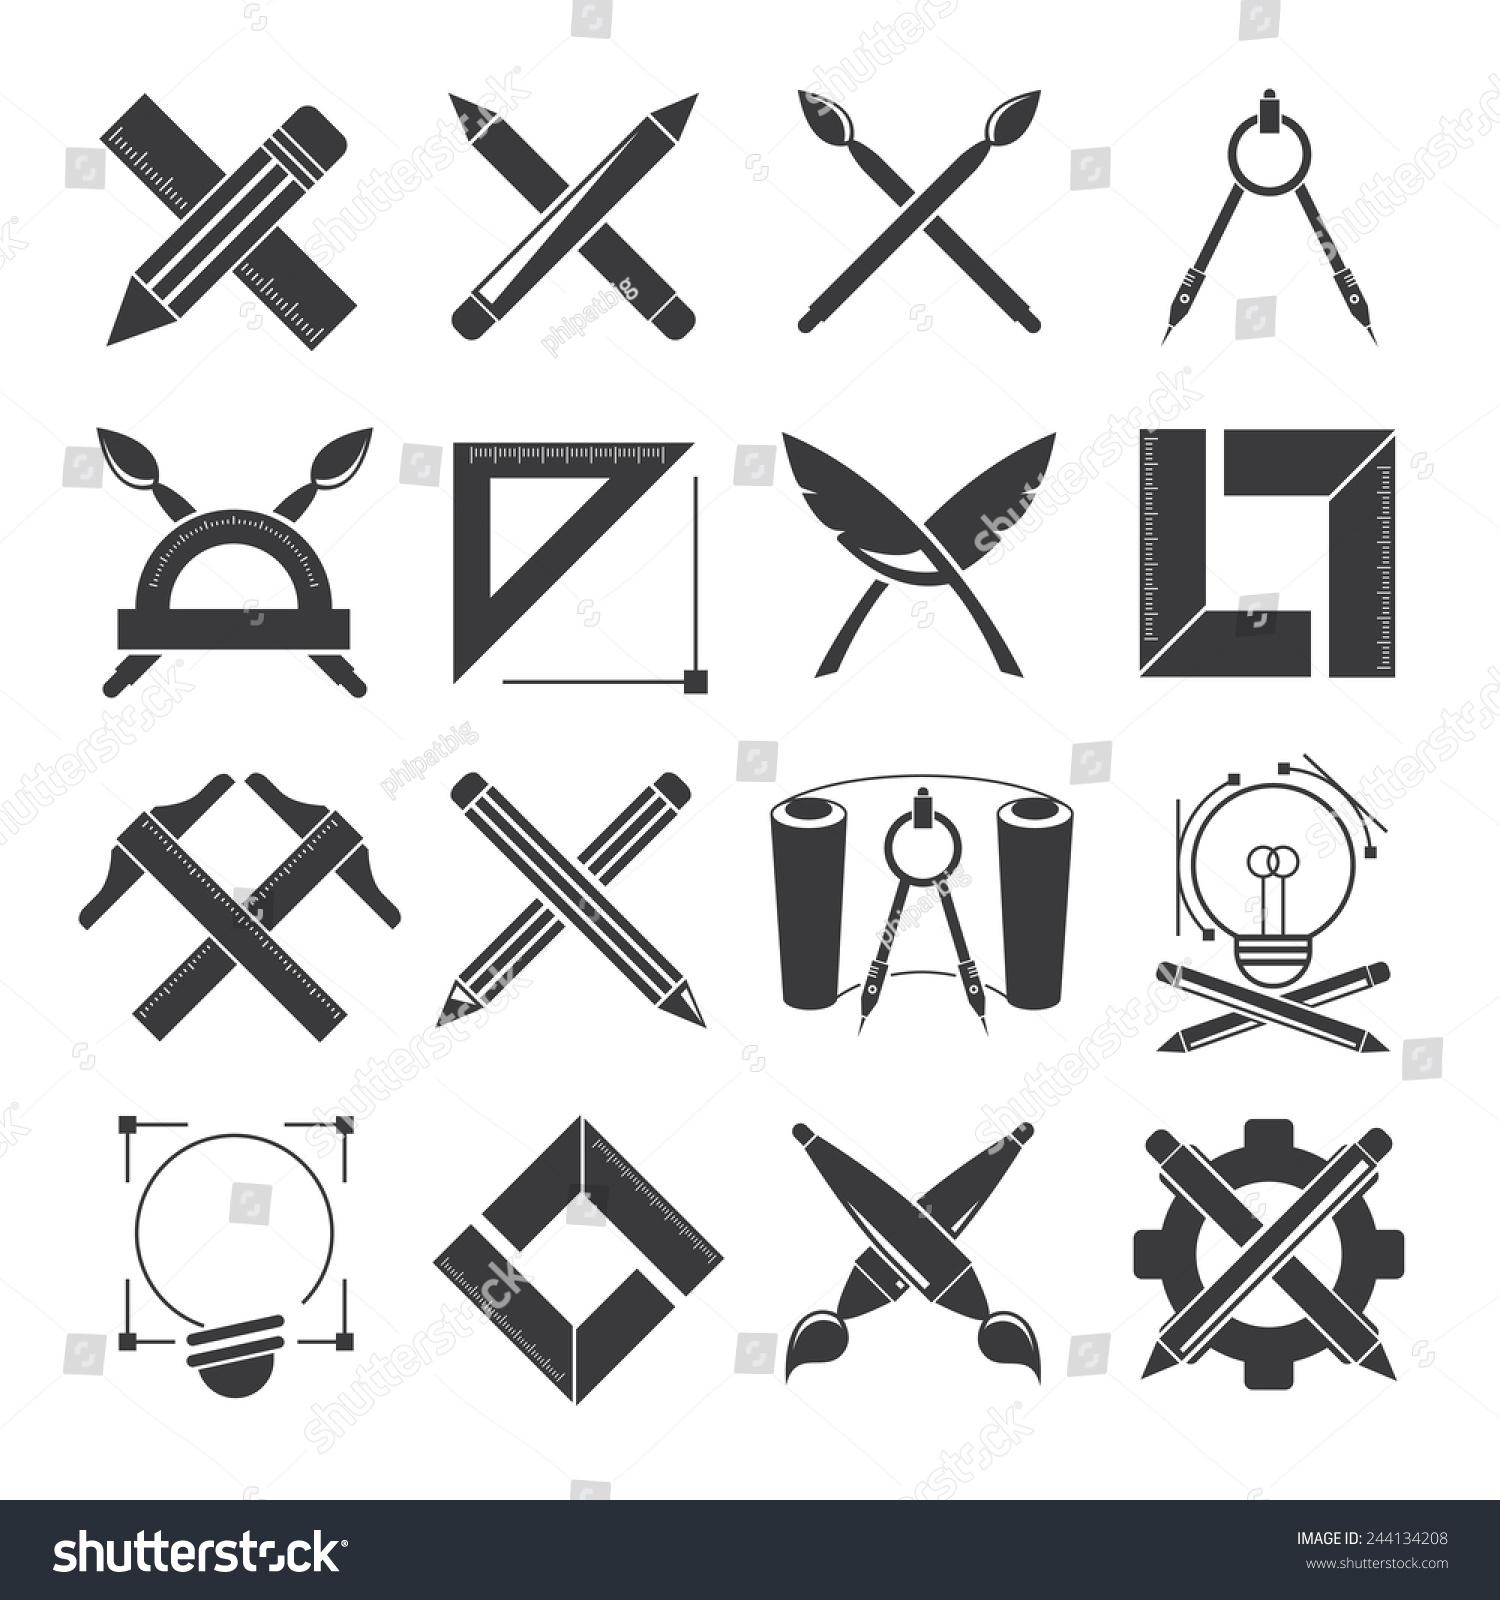 Architect Design Tools Design Concept Drawing Tools Writing Tools